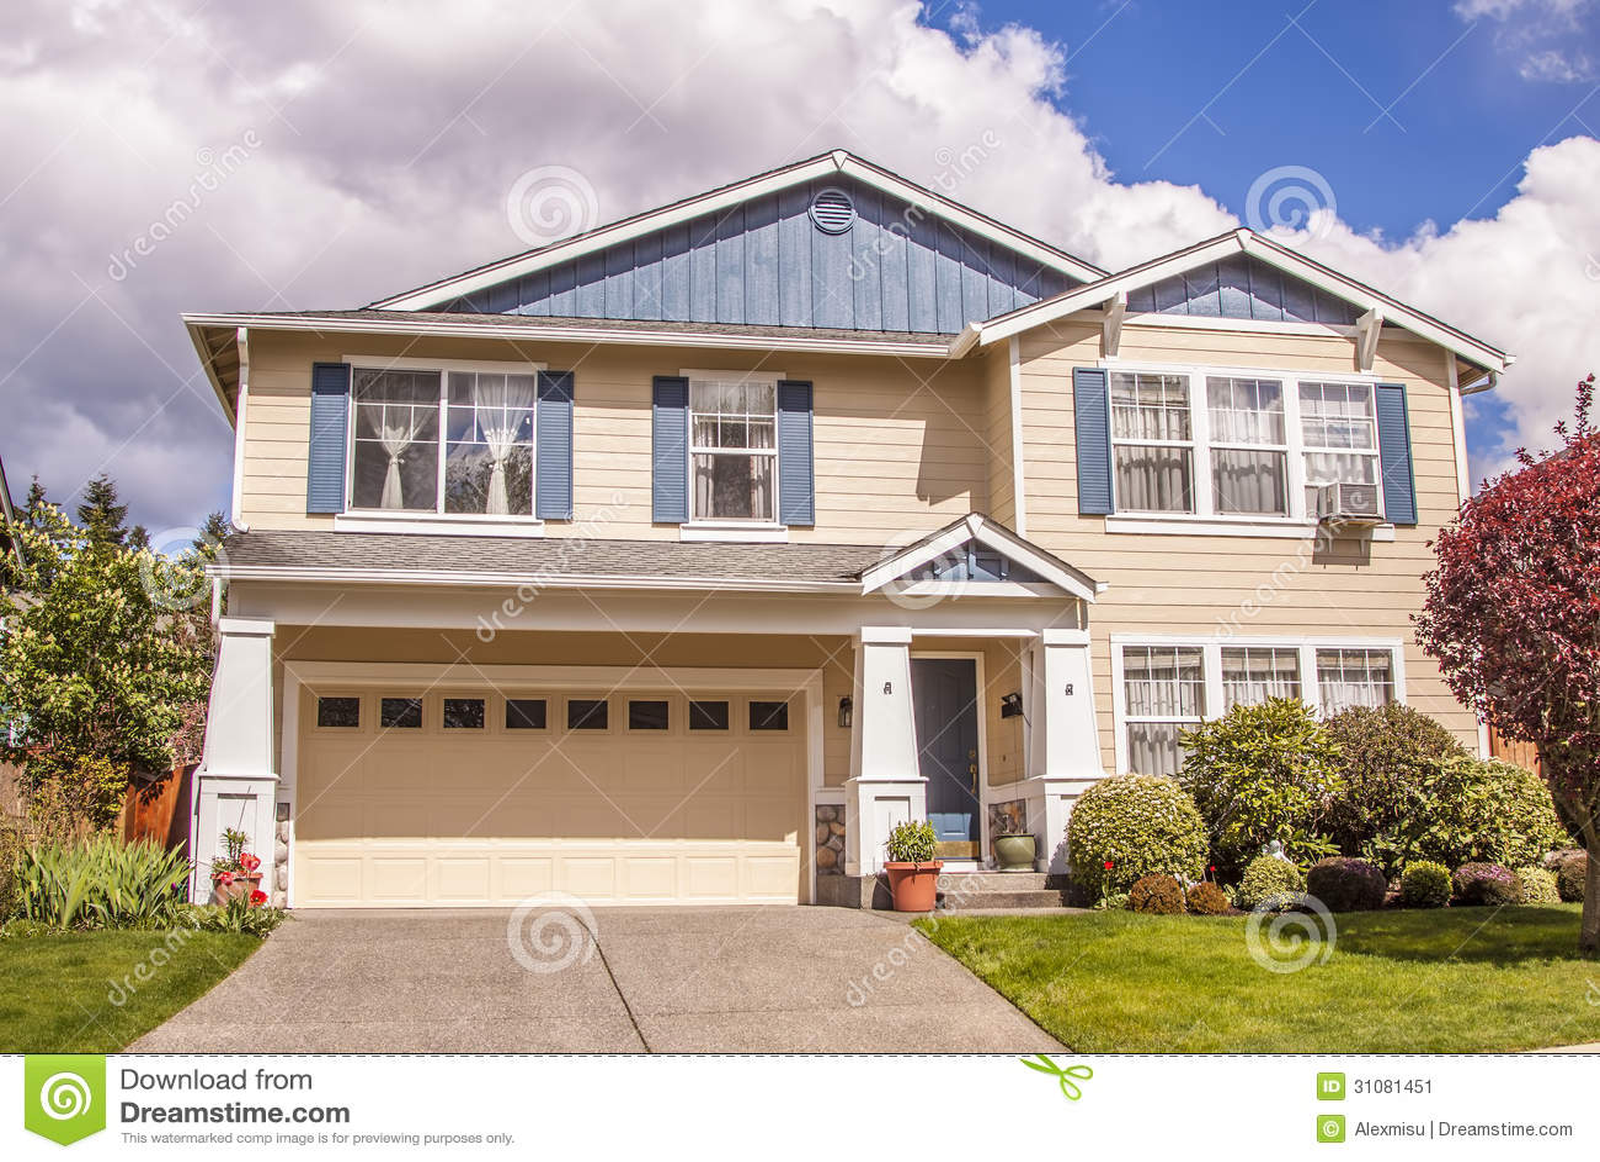 Suburban house stock image image 31081451 for Modern american houses